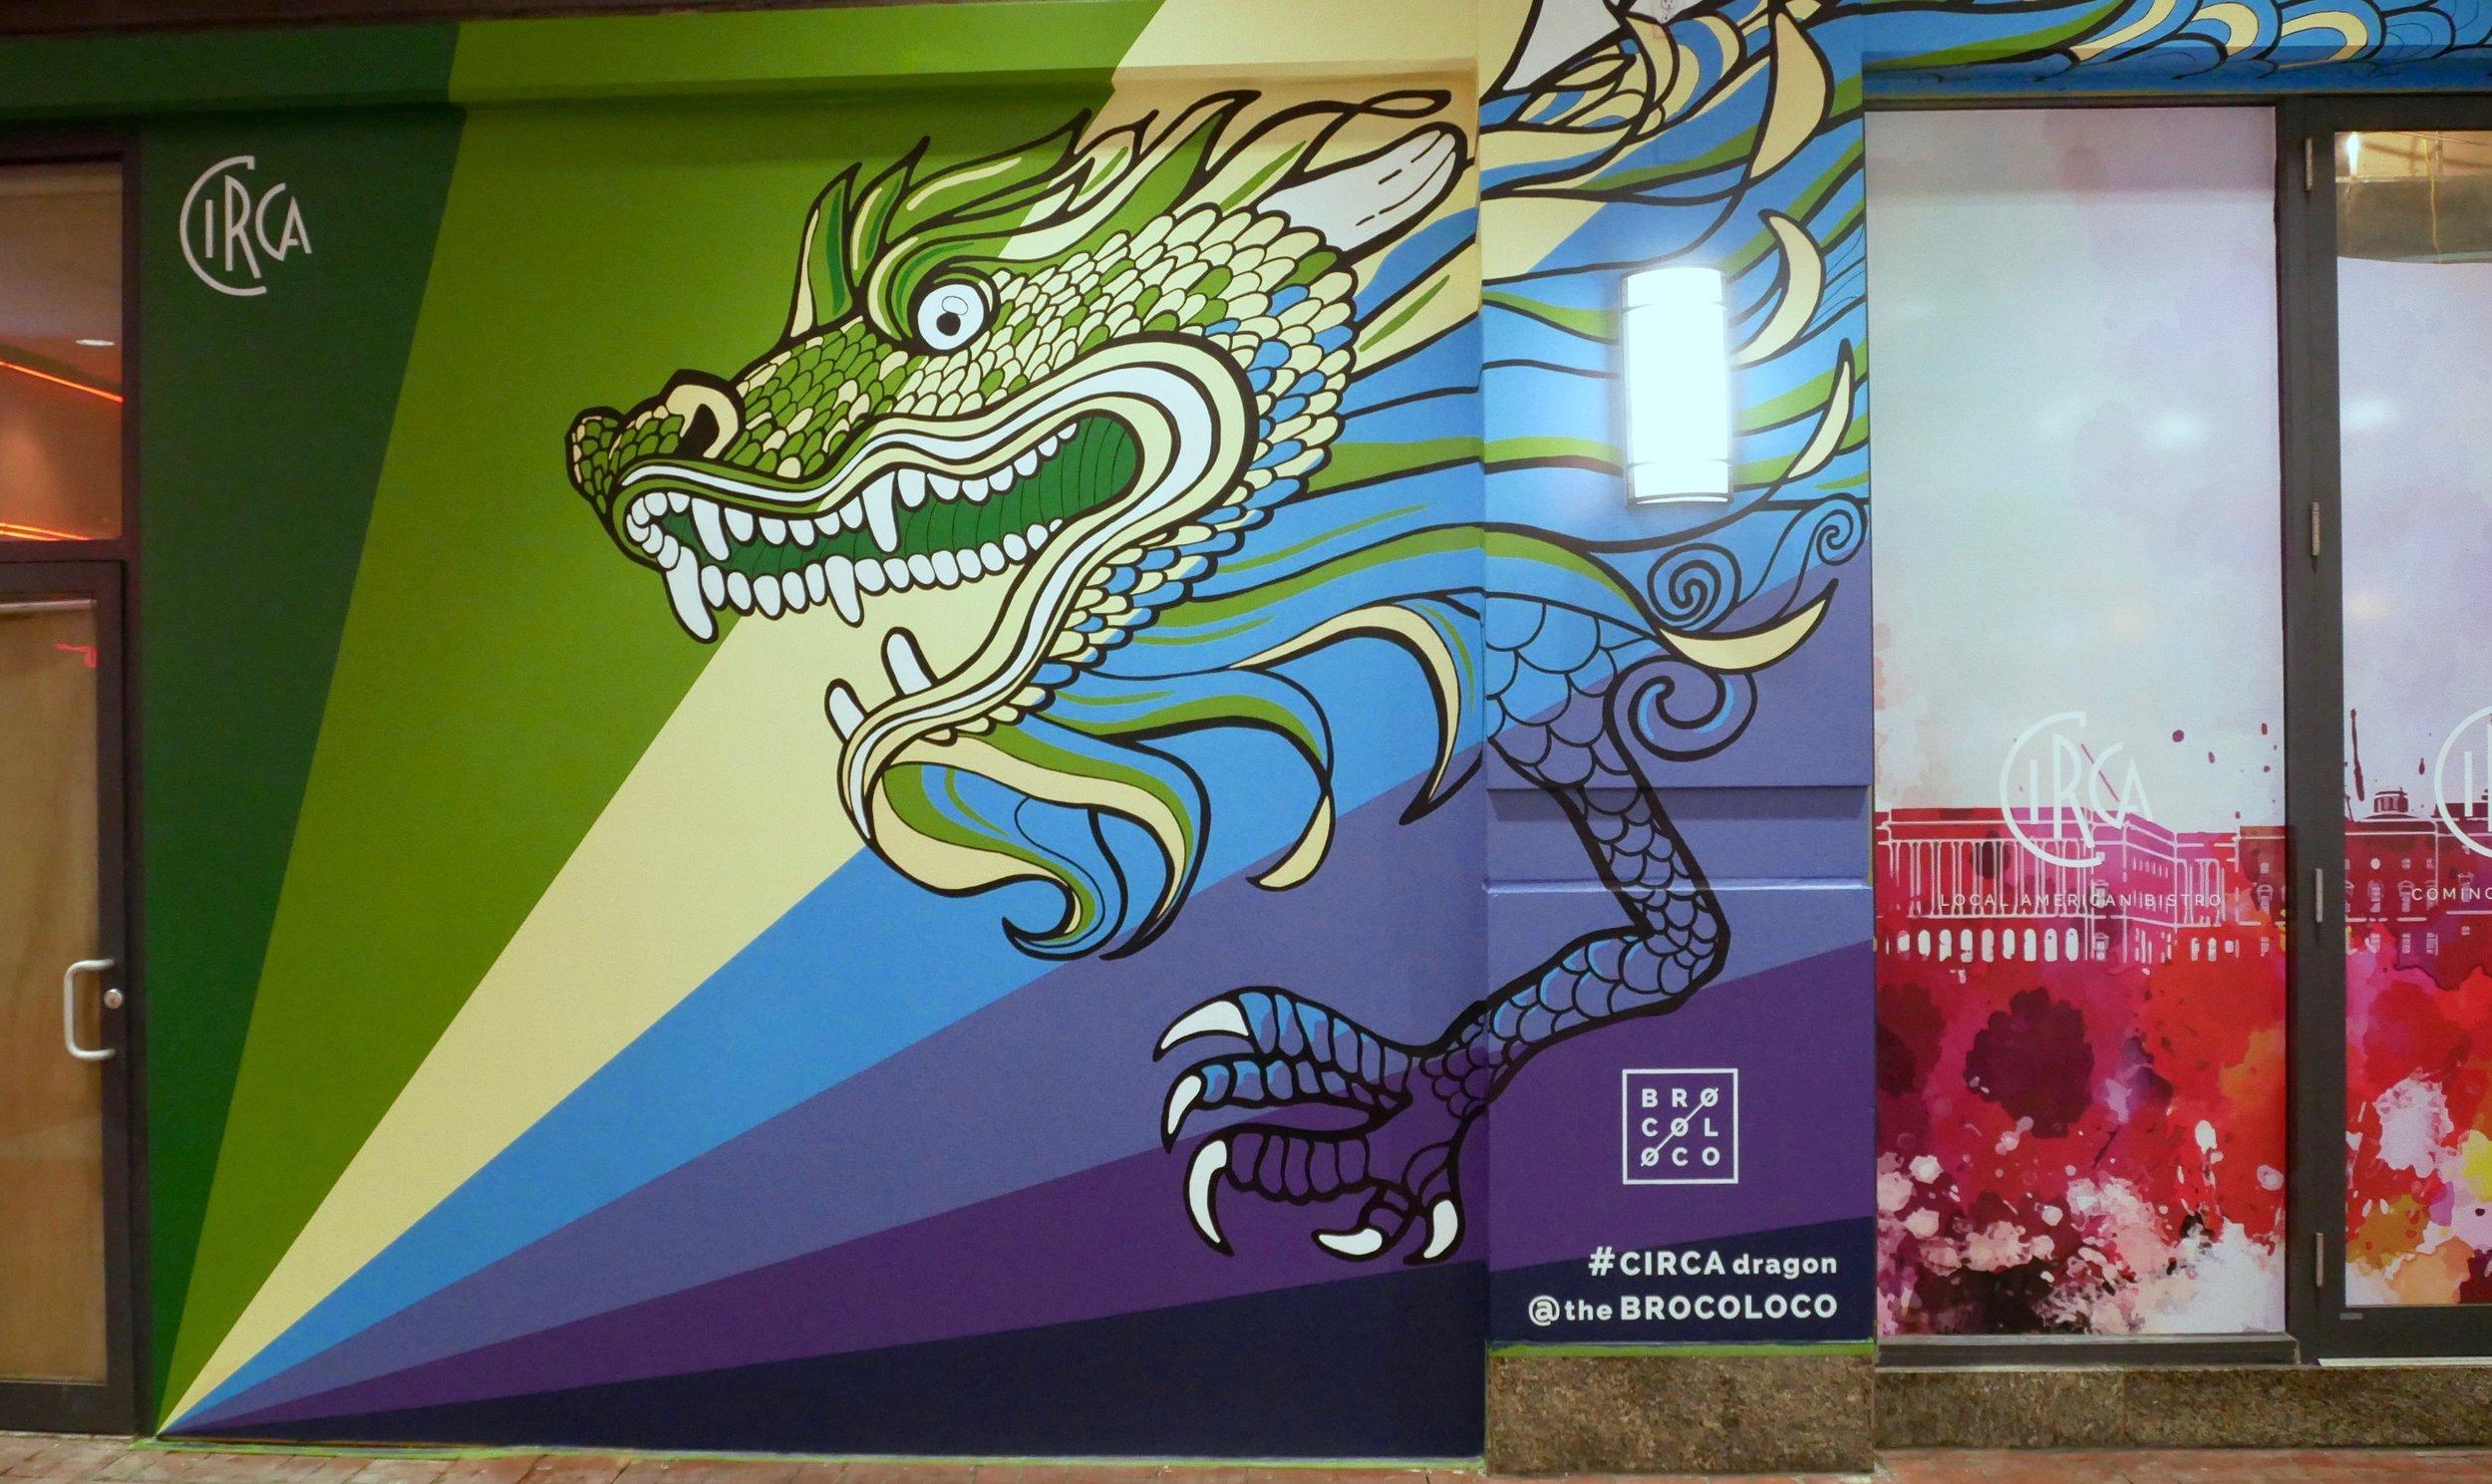 BroCoLoco Chinatown DC CIRCA dragon mural 3.jpg